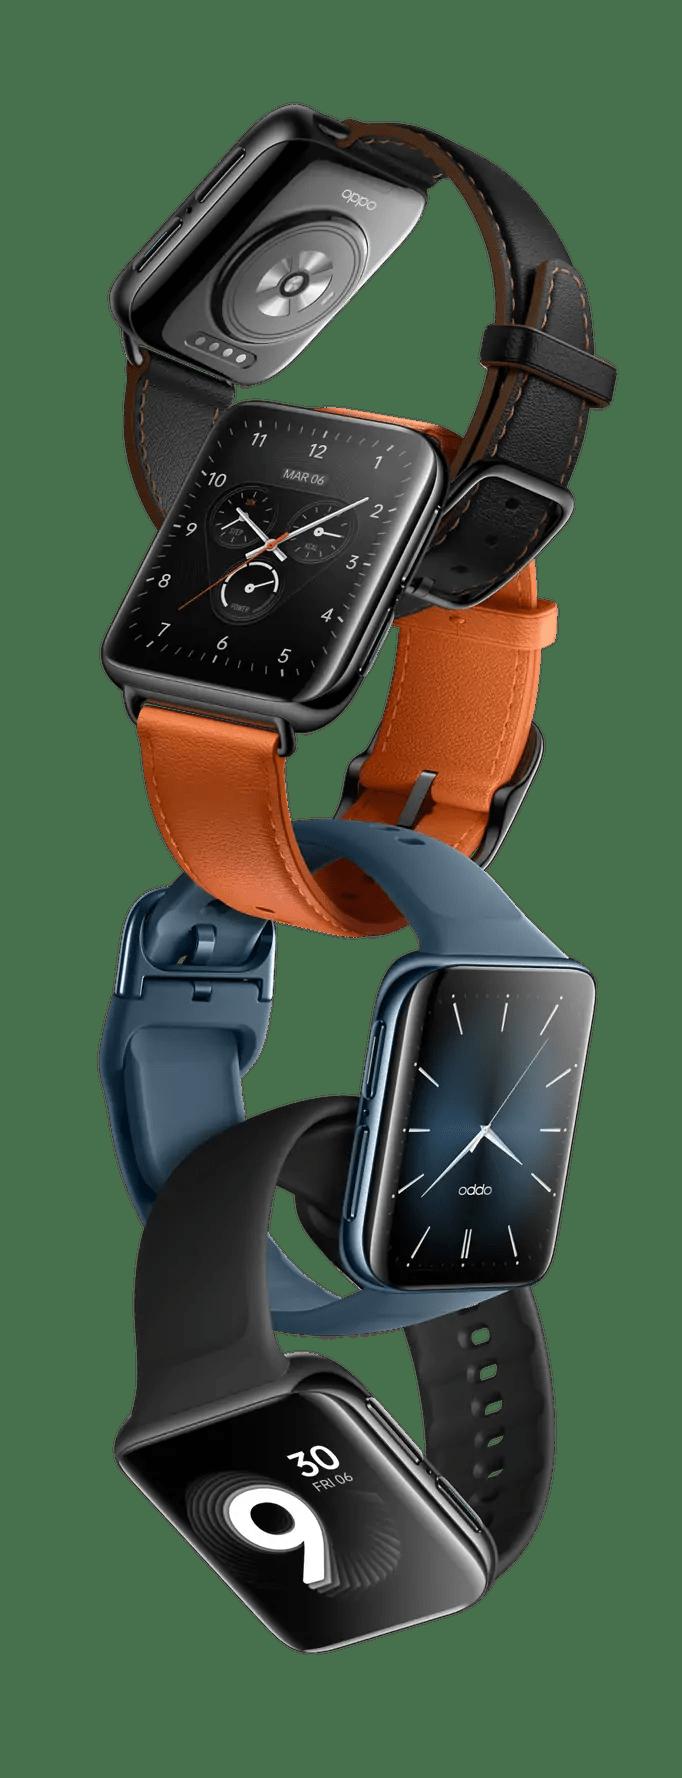 OPPO Watch 2 ECG Version Debuts Millisecond Precision ECG Detection